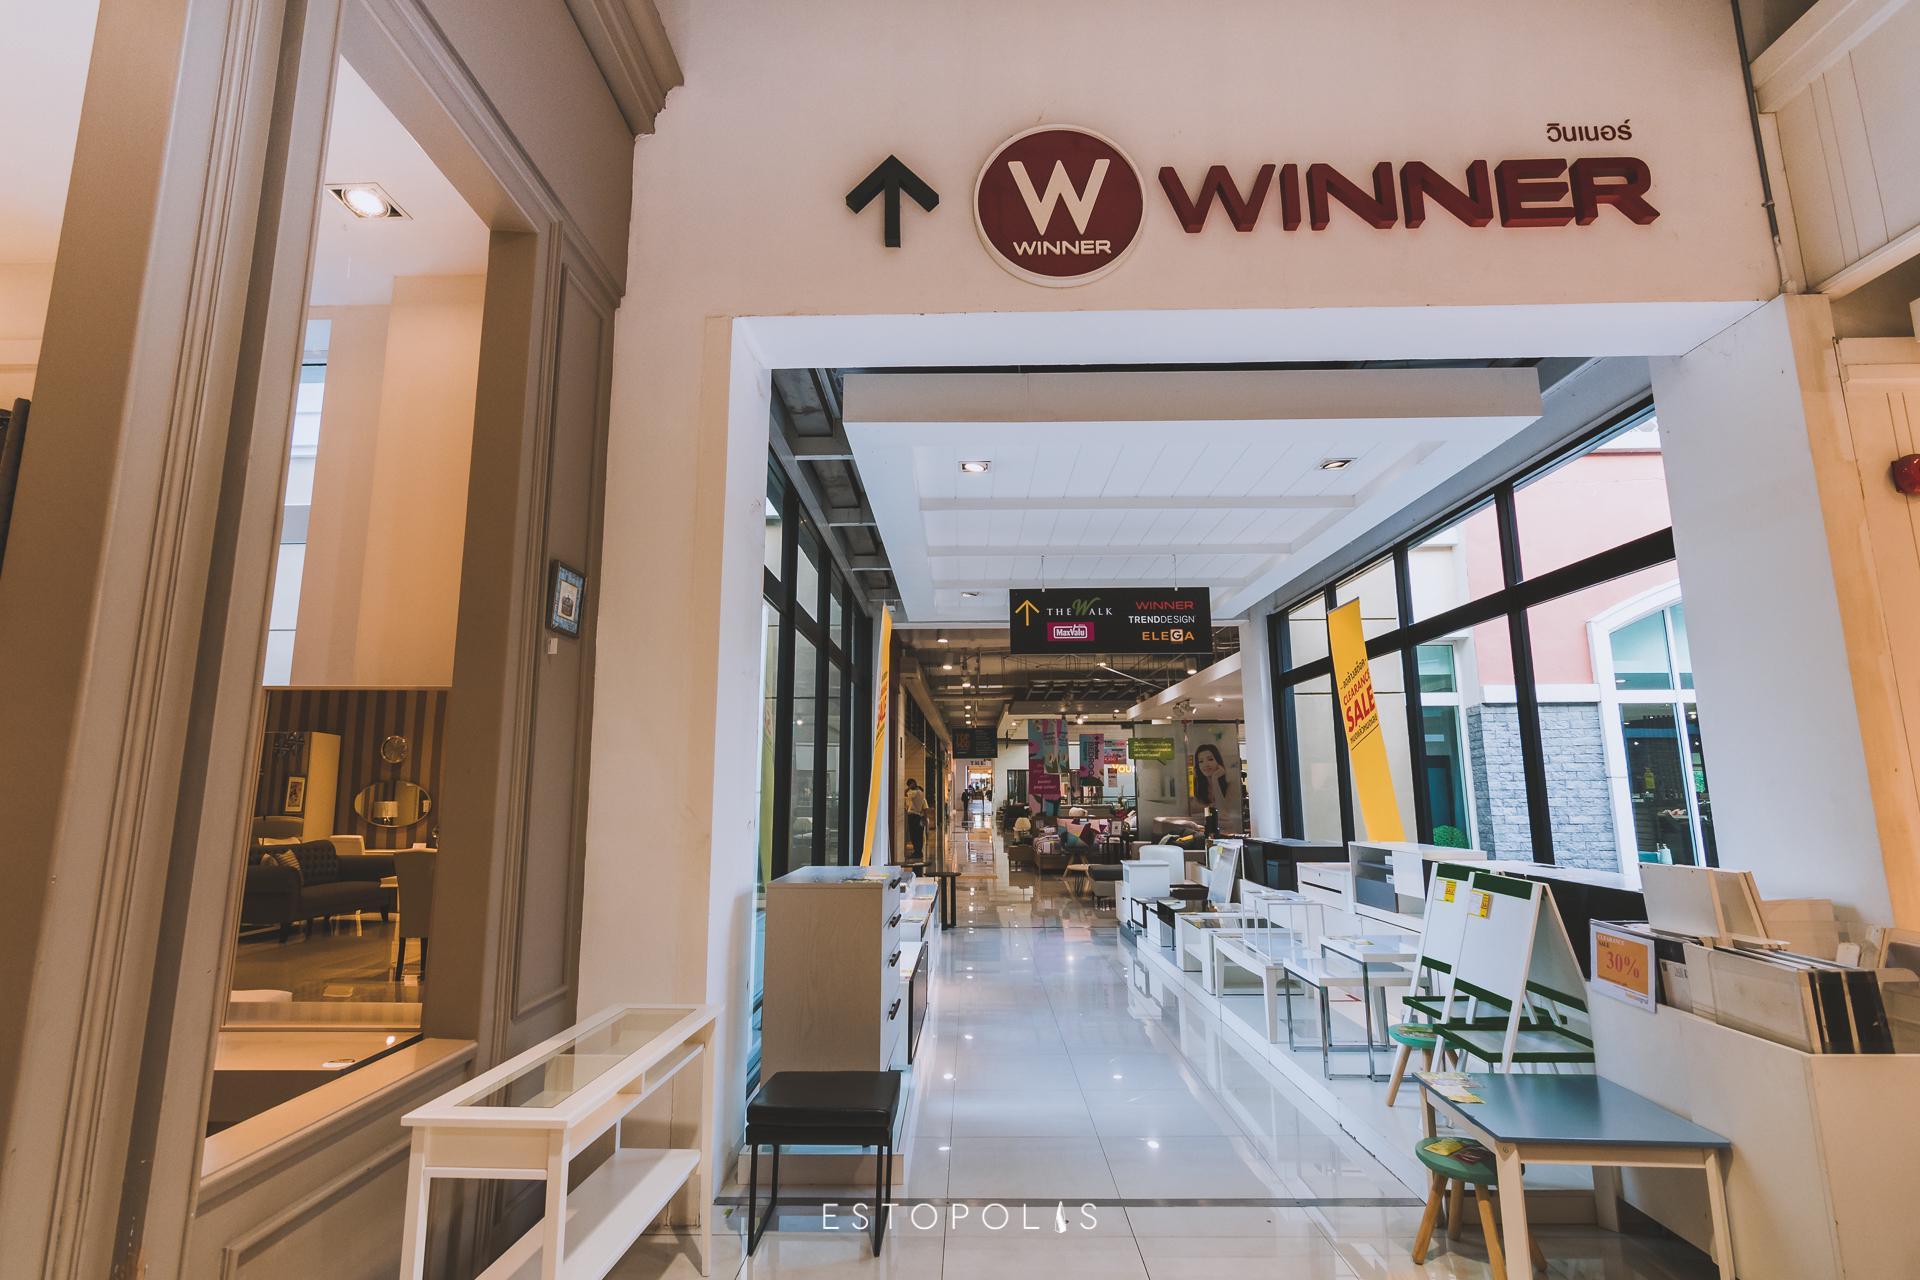 winner furniture แบรนด์ดีไซน์เดิม แต่ราคาลดลงจาก ร้านเฟอร์นิเจอร์ Index Living mall